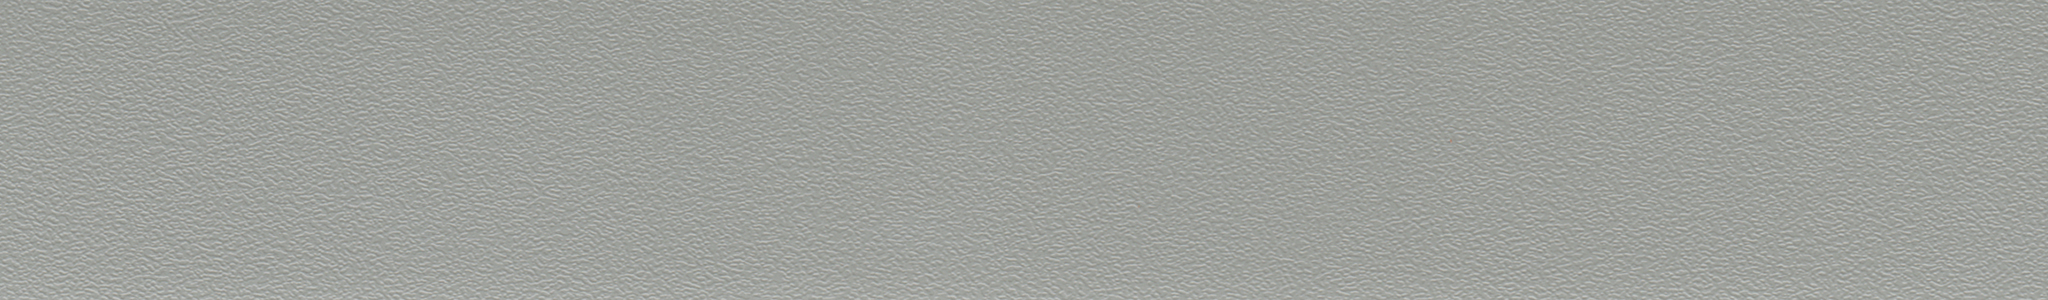 HU 18740 ABS Edge Brown Pearl XG